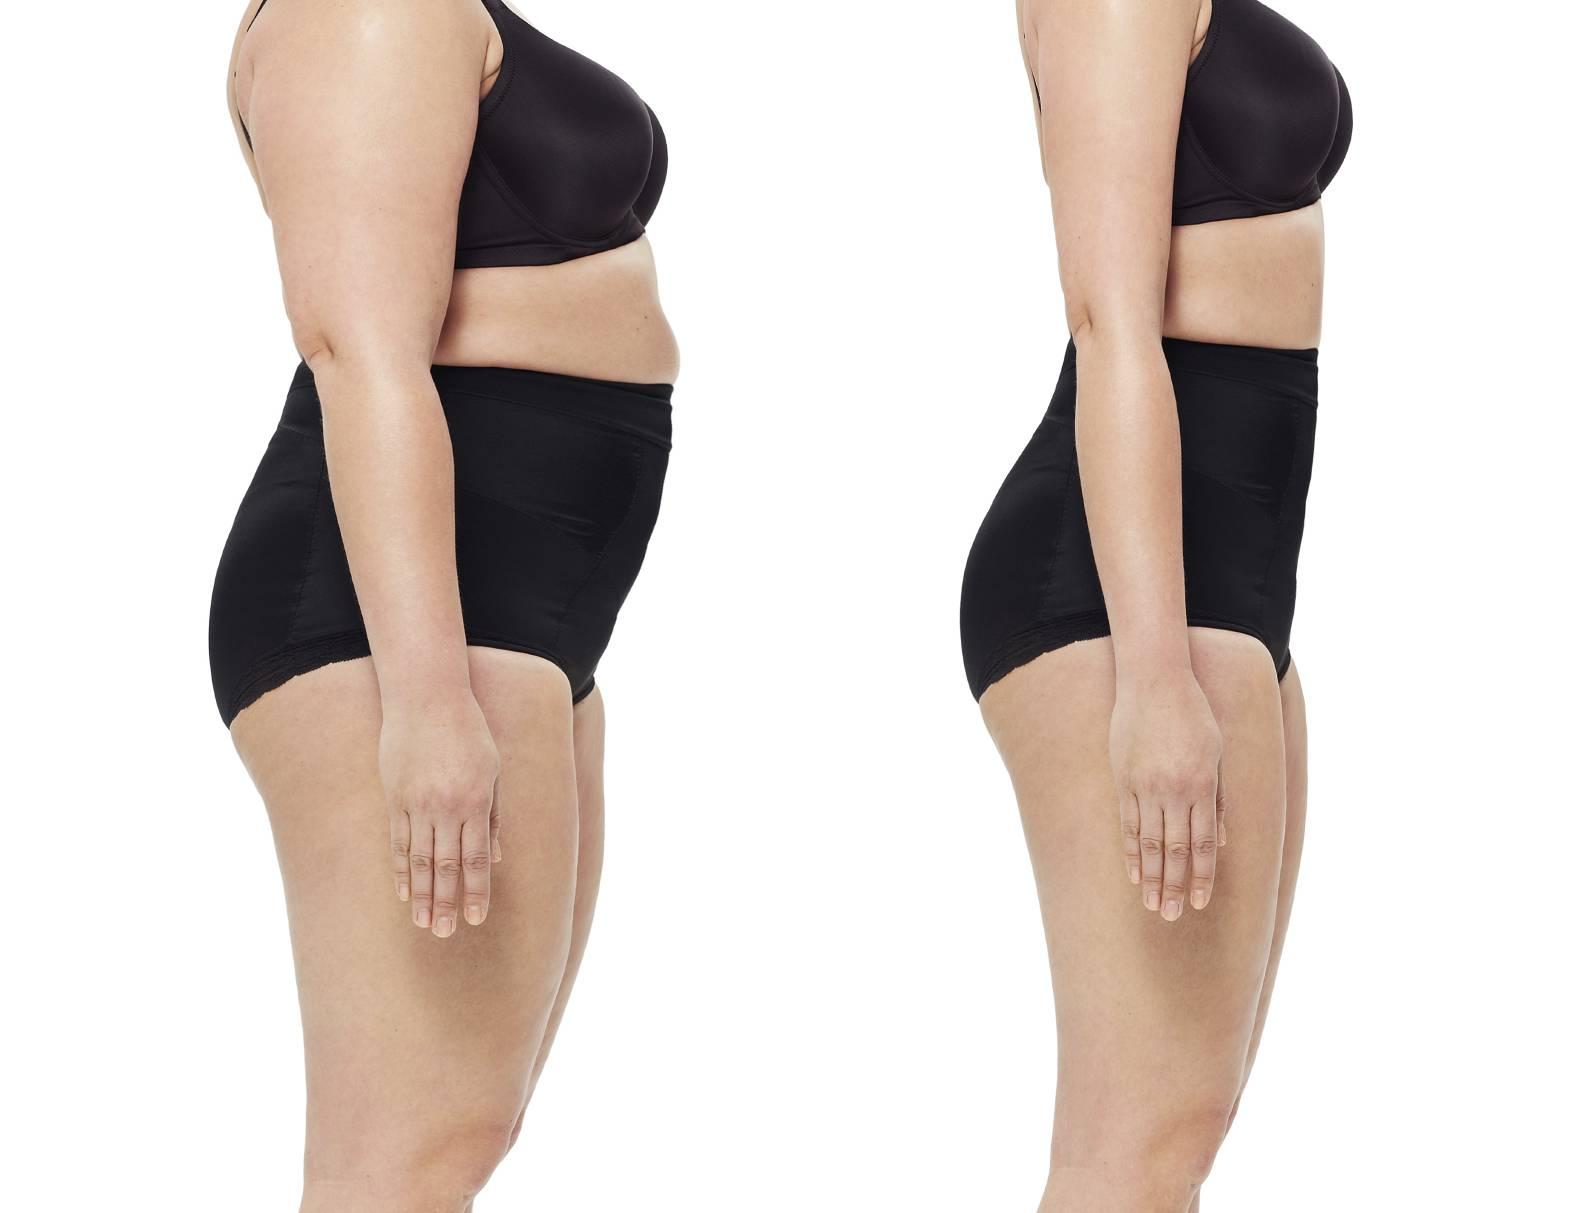 Diete Veloci 10 Kg In 2 Settimane : Dieta fast meno kg in due mesi